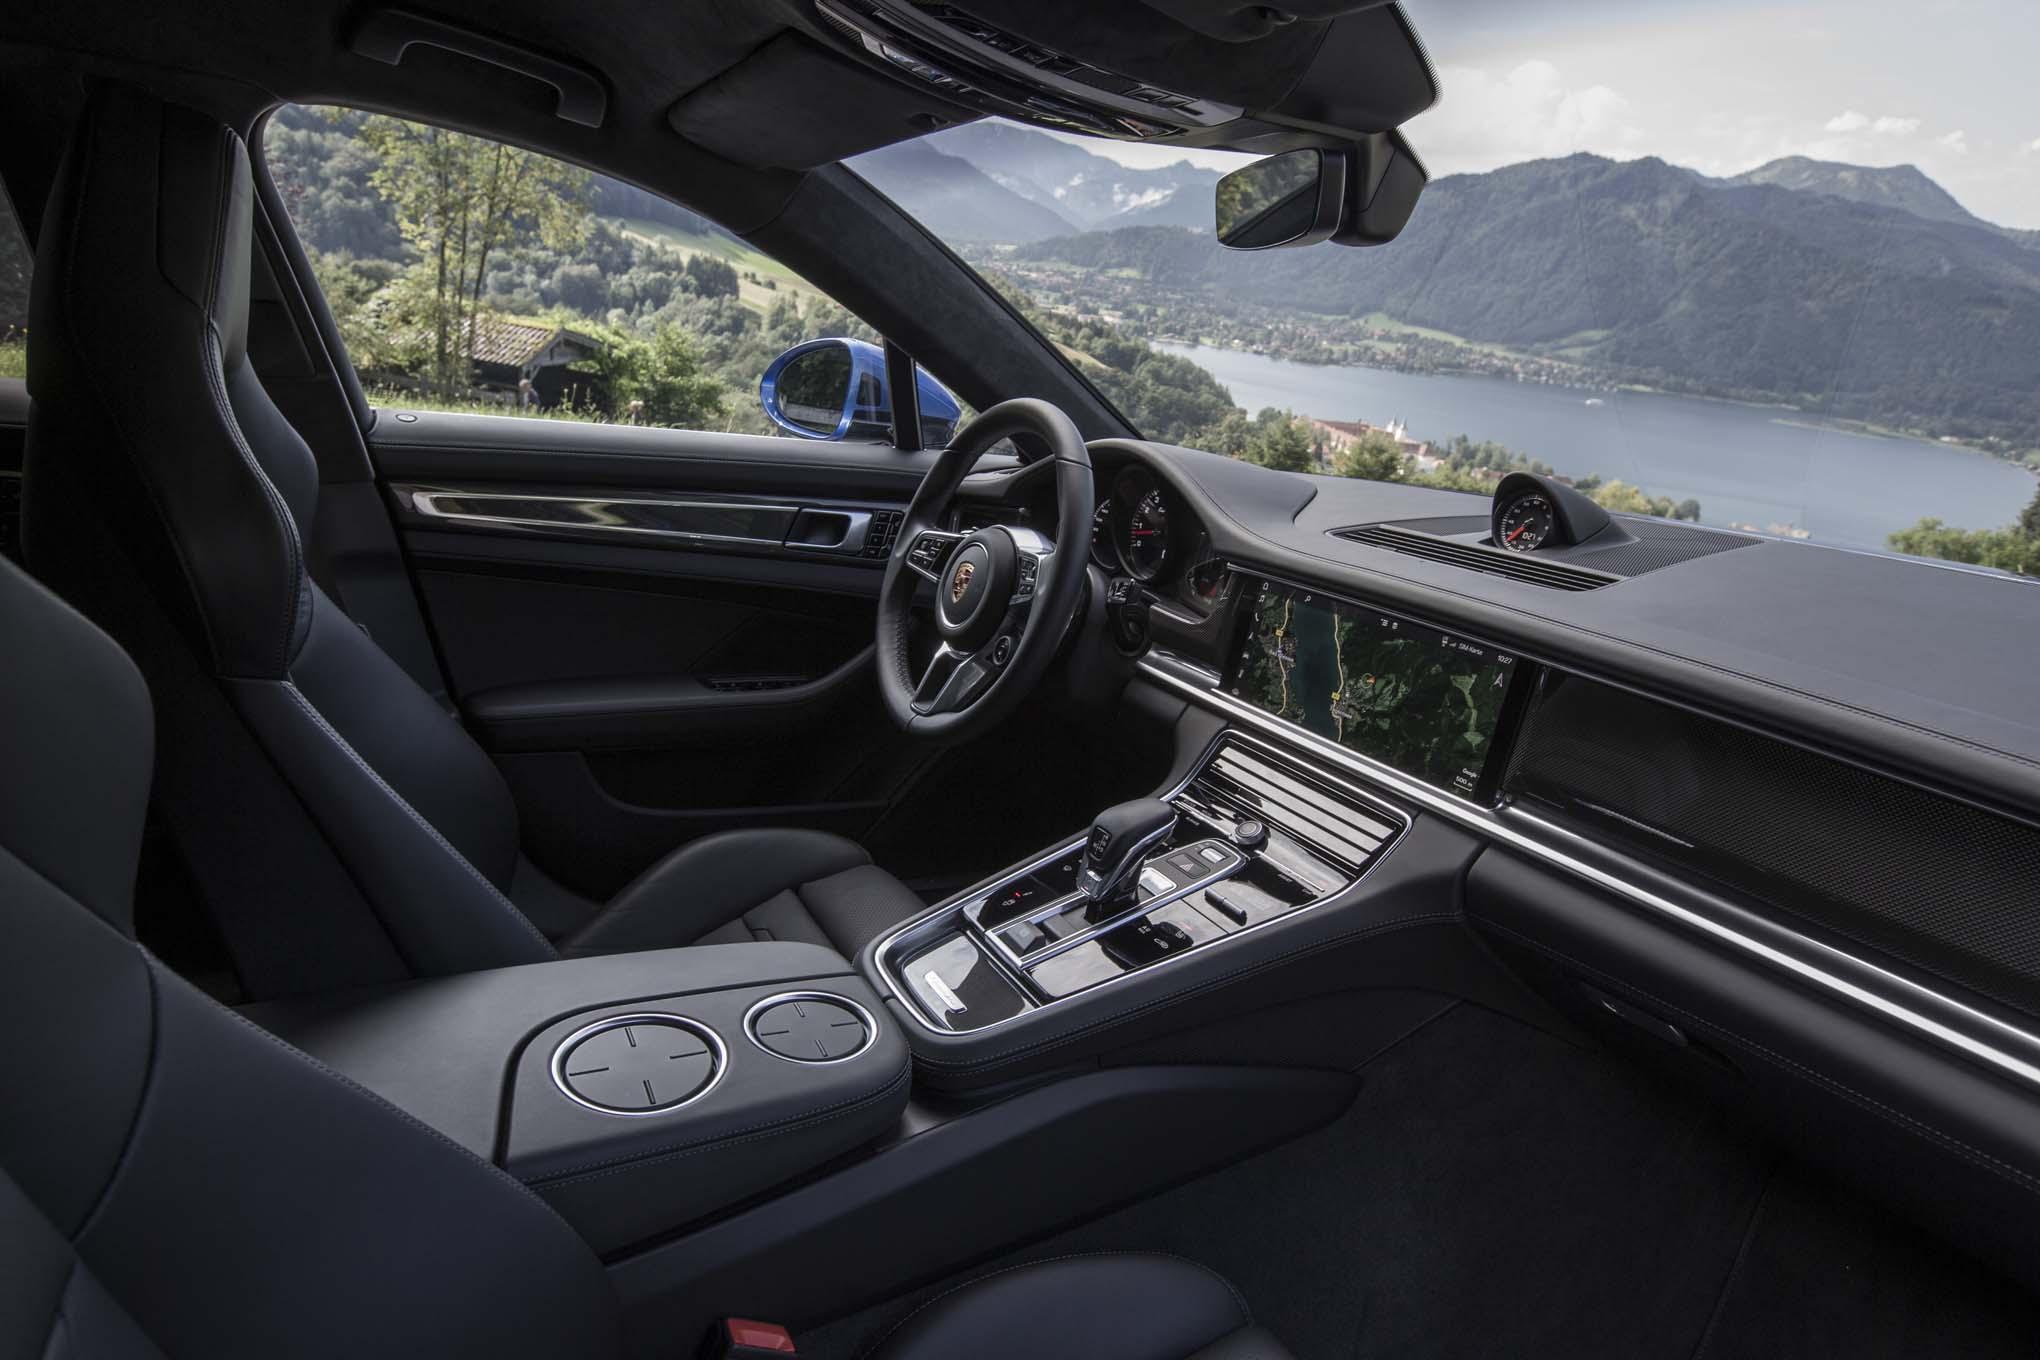 2017 Porsche Panamera 4S First Drive Review Automobile